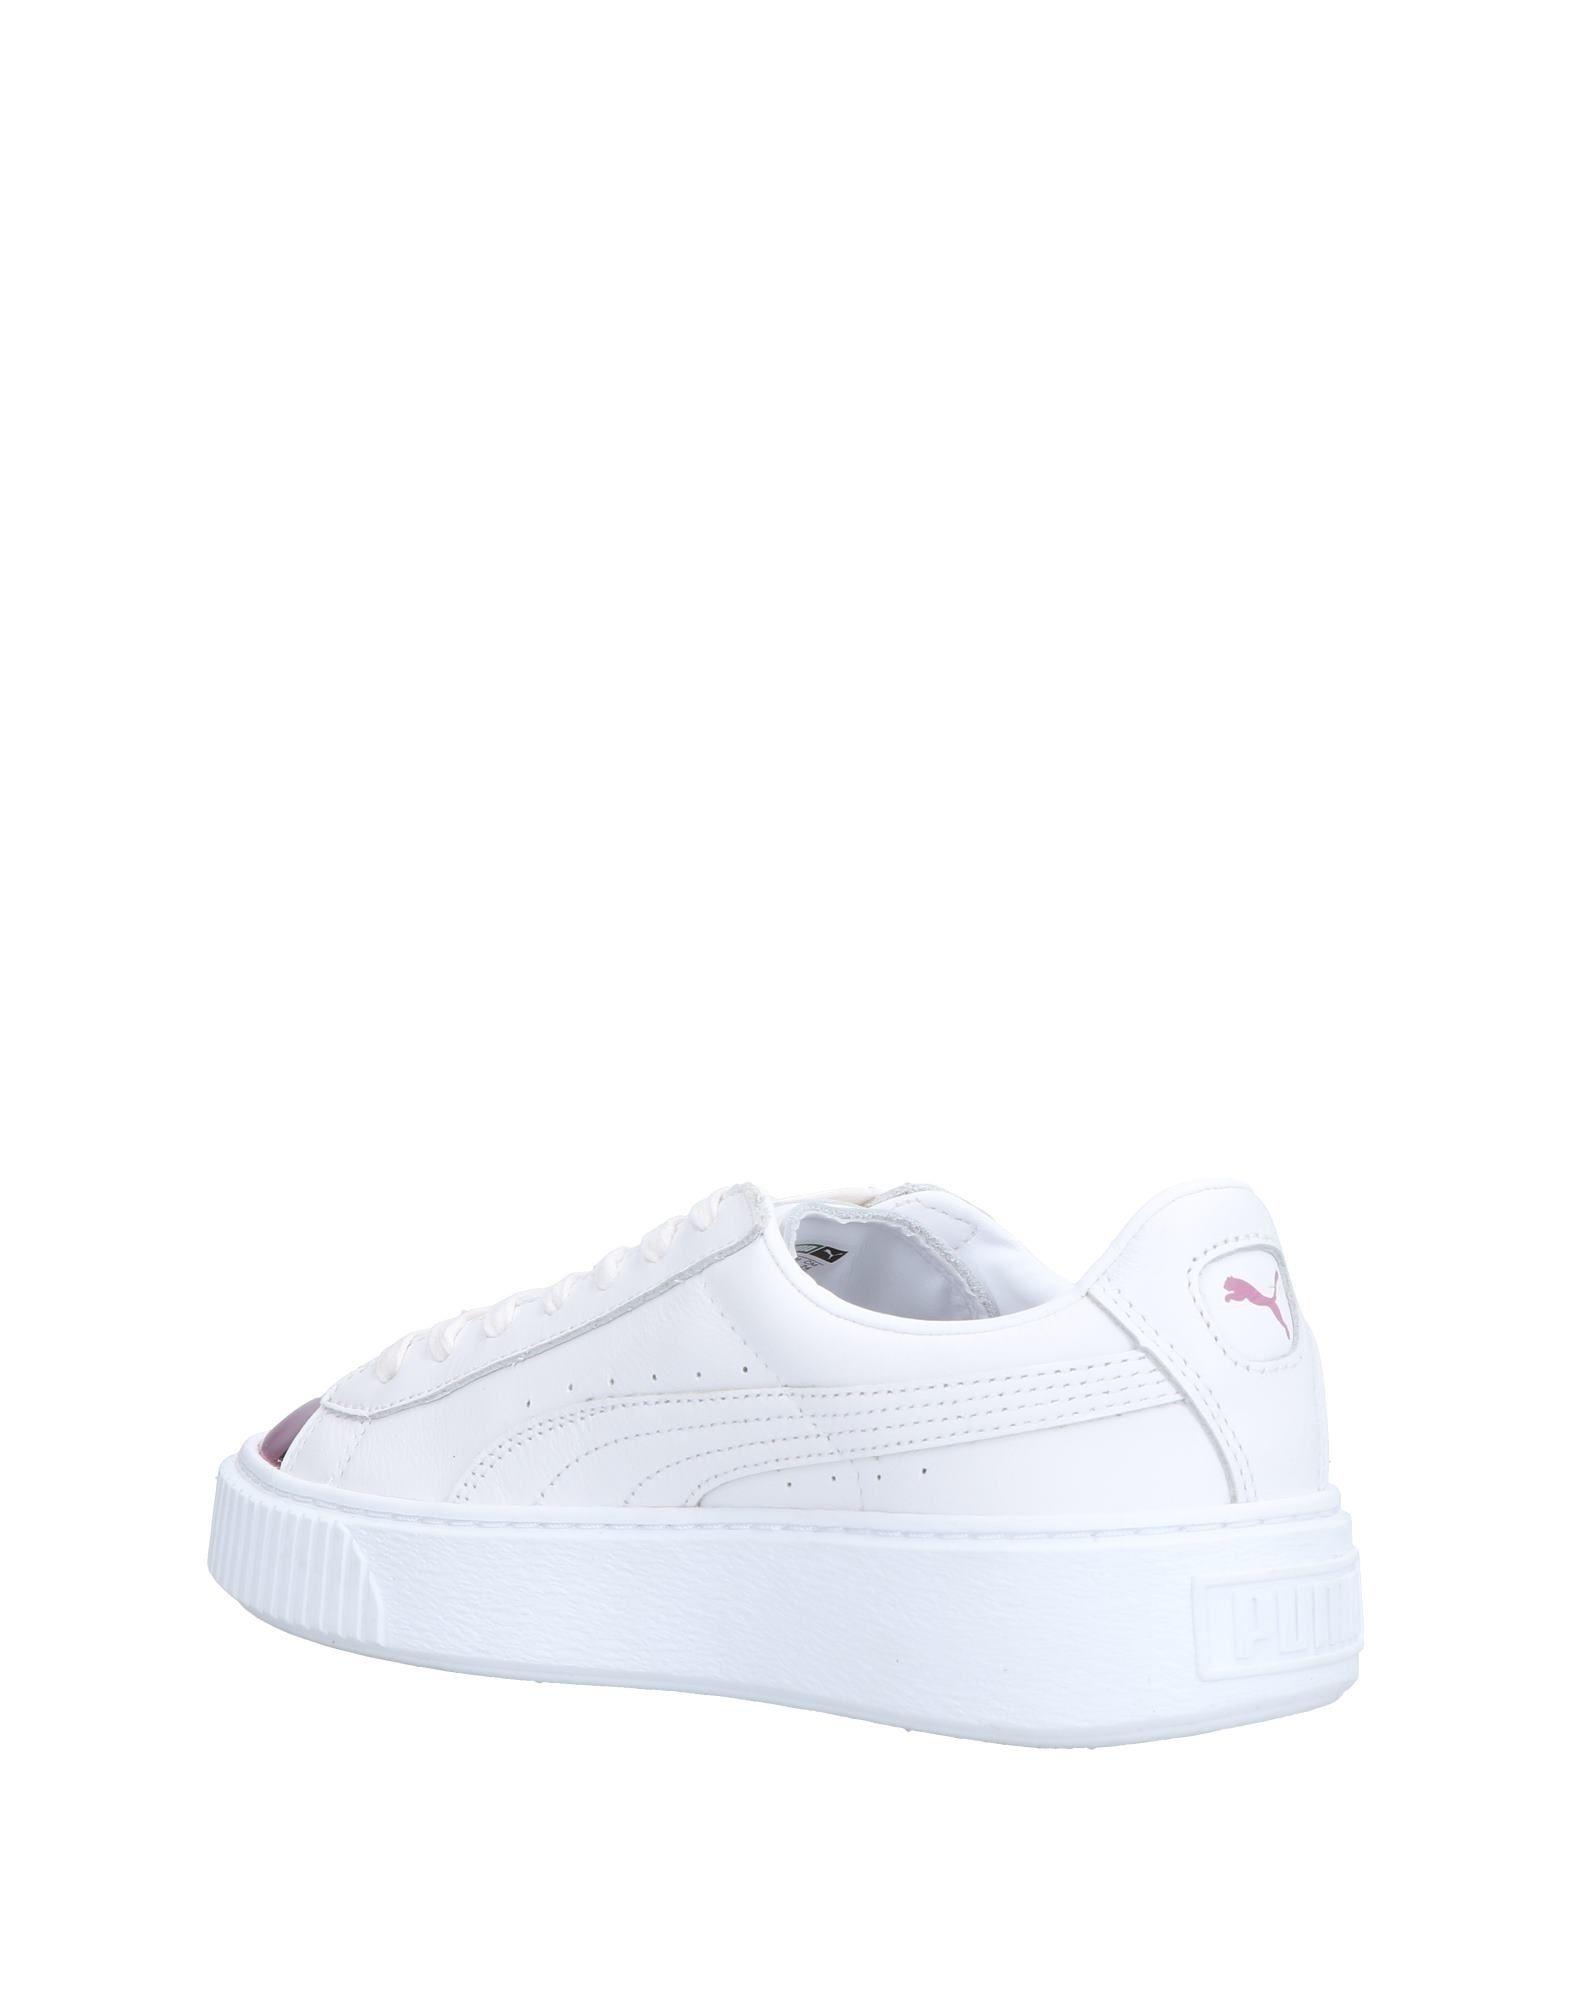 Puma Sneakers Damen Qualität  11509884BC Gute Qualität Damen beliebte Schuhe acc919